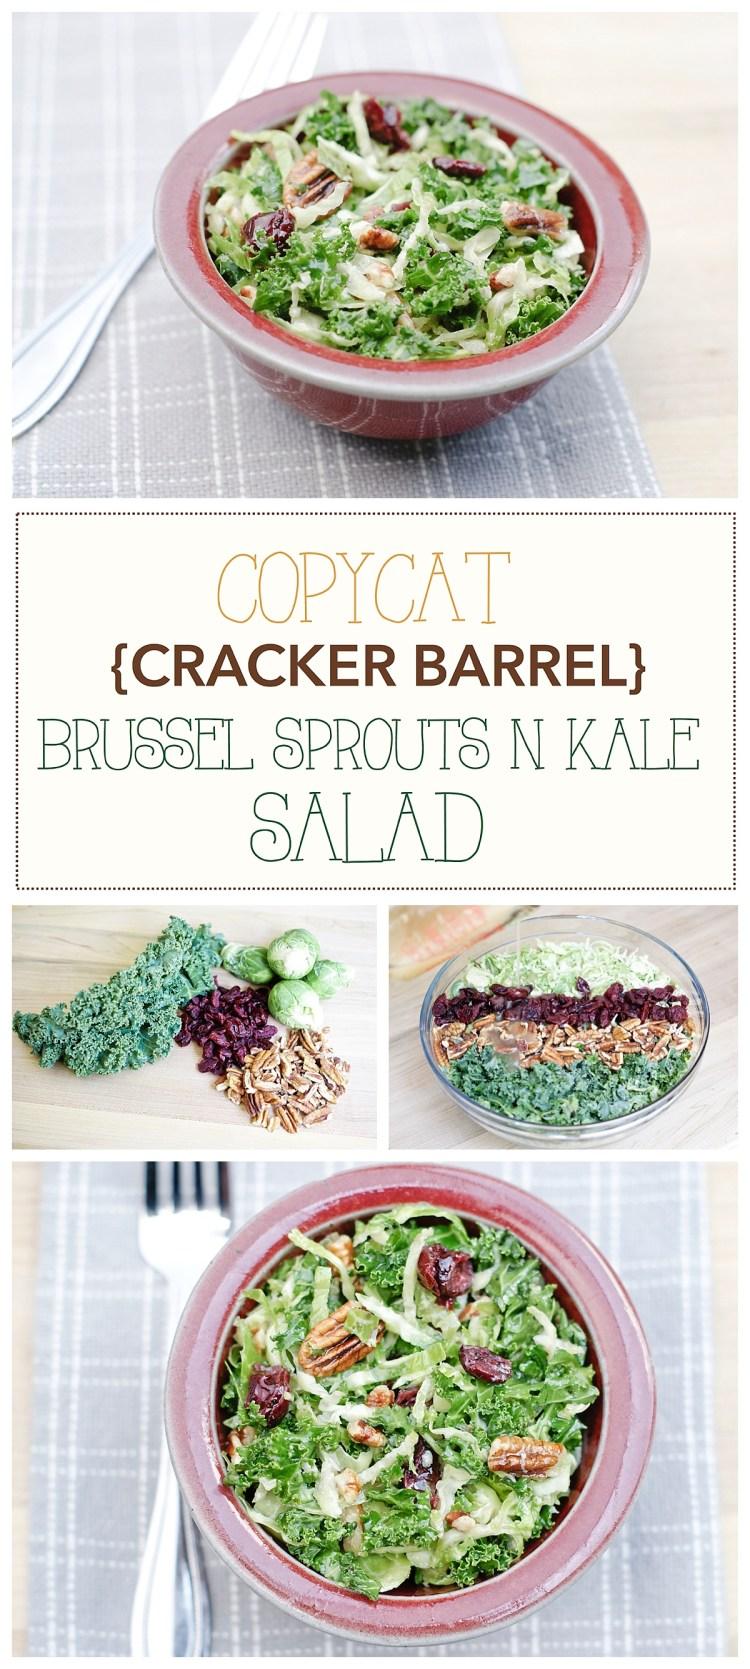 Cracker Barrel Recipes | Cracker Barrel Copycat Brussel Sprouts n Kale Salad Recipe | Vegan Healthy Salad | Gluten free | Pecans Craisins Salad | Maple Vinaigrette Recipe | Healthy Meal Ideas | Healthy Recipes | Spring Summer Salads | Copycat Recipes | Six Clever Sisters